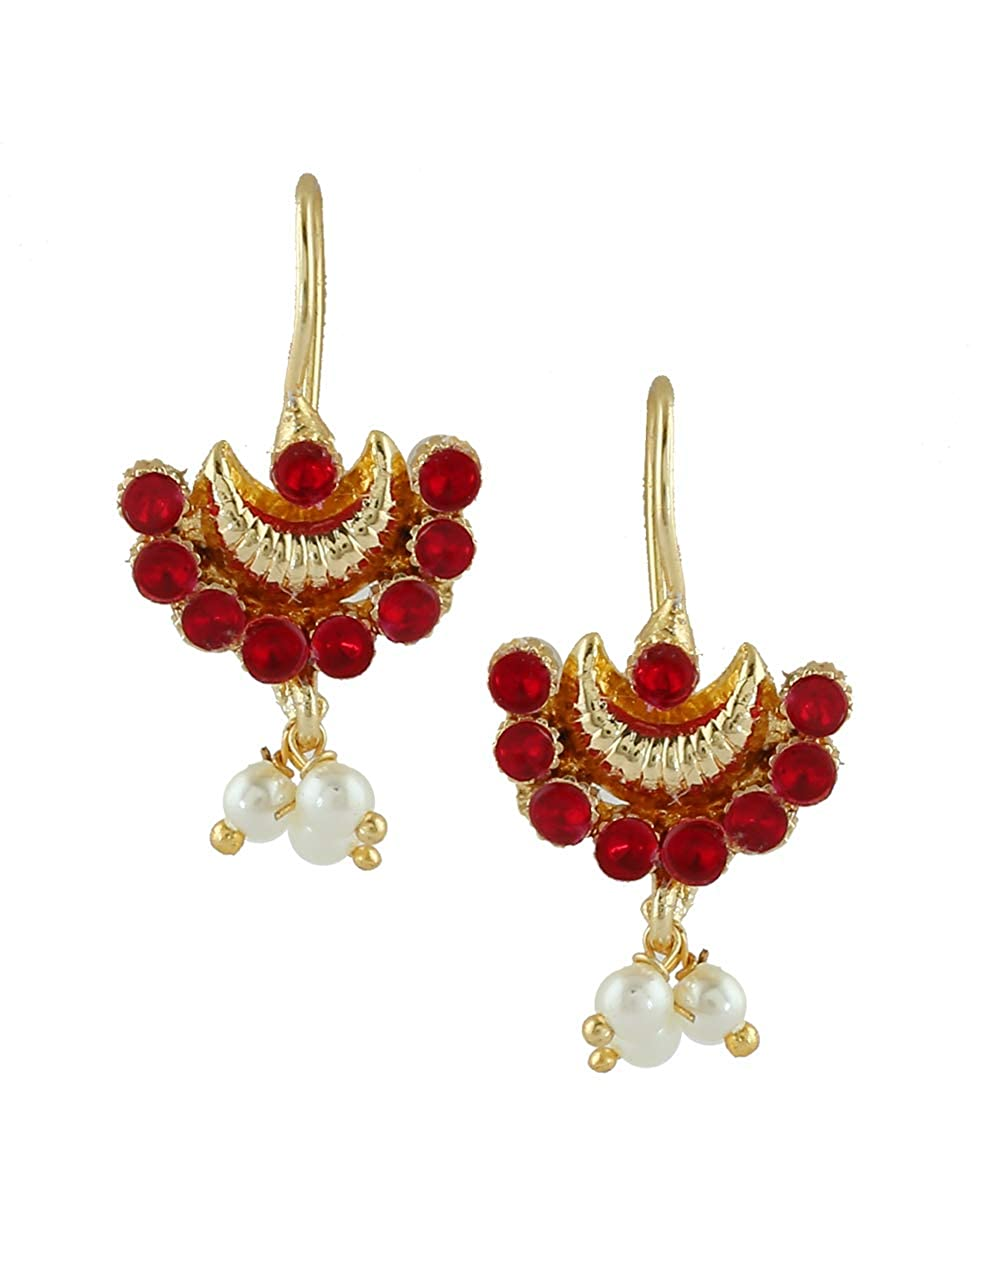 Colorful Bohemian Feather Dangle Drop Earring Gifts for Women Girls Jewelry000001001833